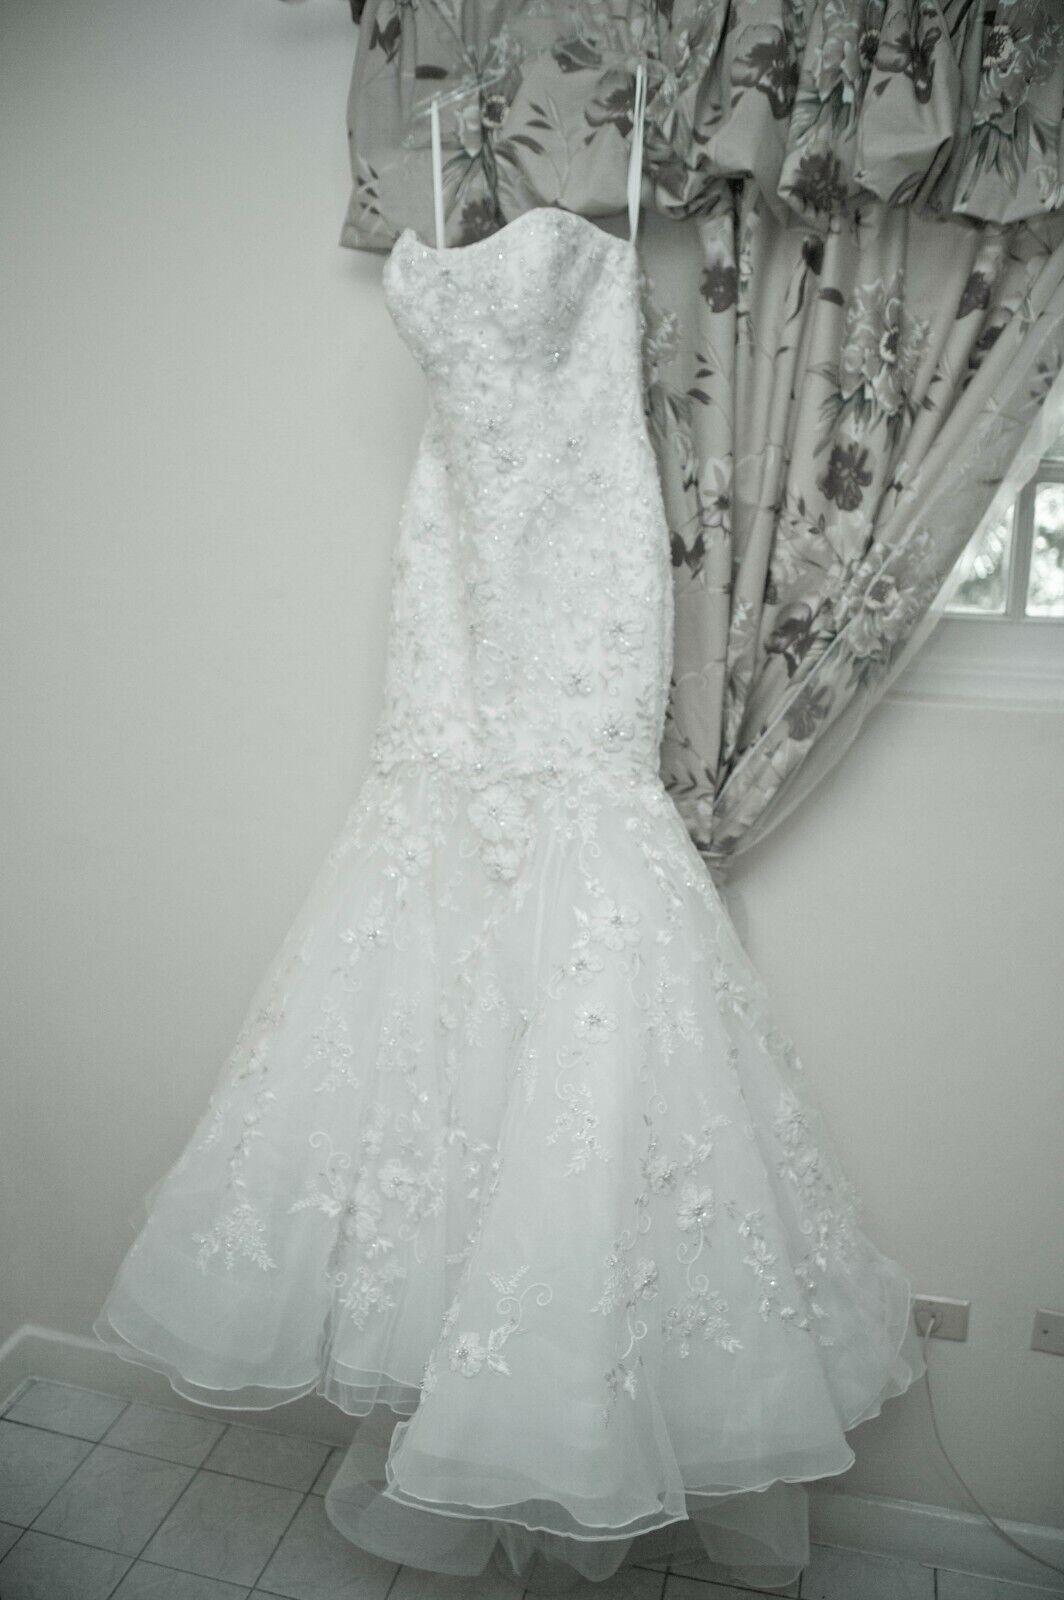 Allure Couture Mermaid Wedding Dress - C205 in Iv… - image 1